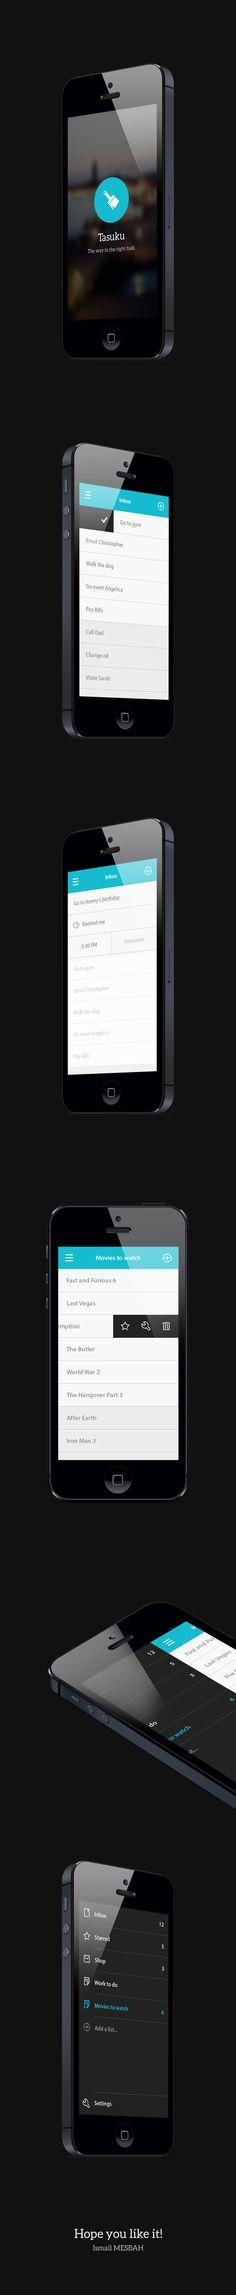 Phone To Do's App - Tasuku by Ismail MESBAH, via Behance